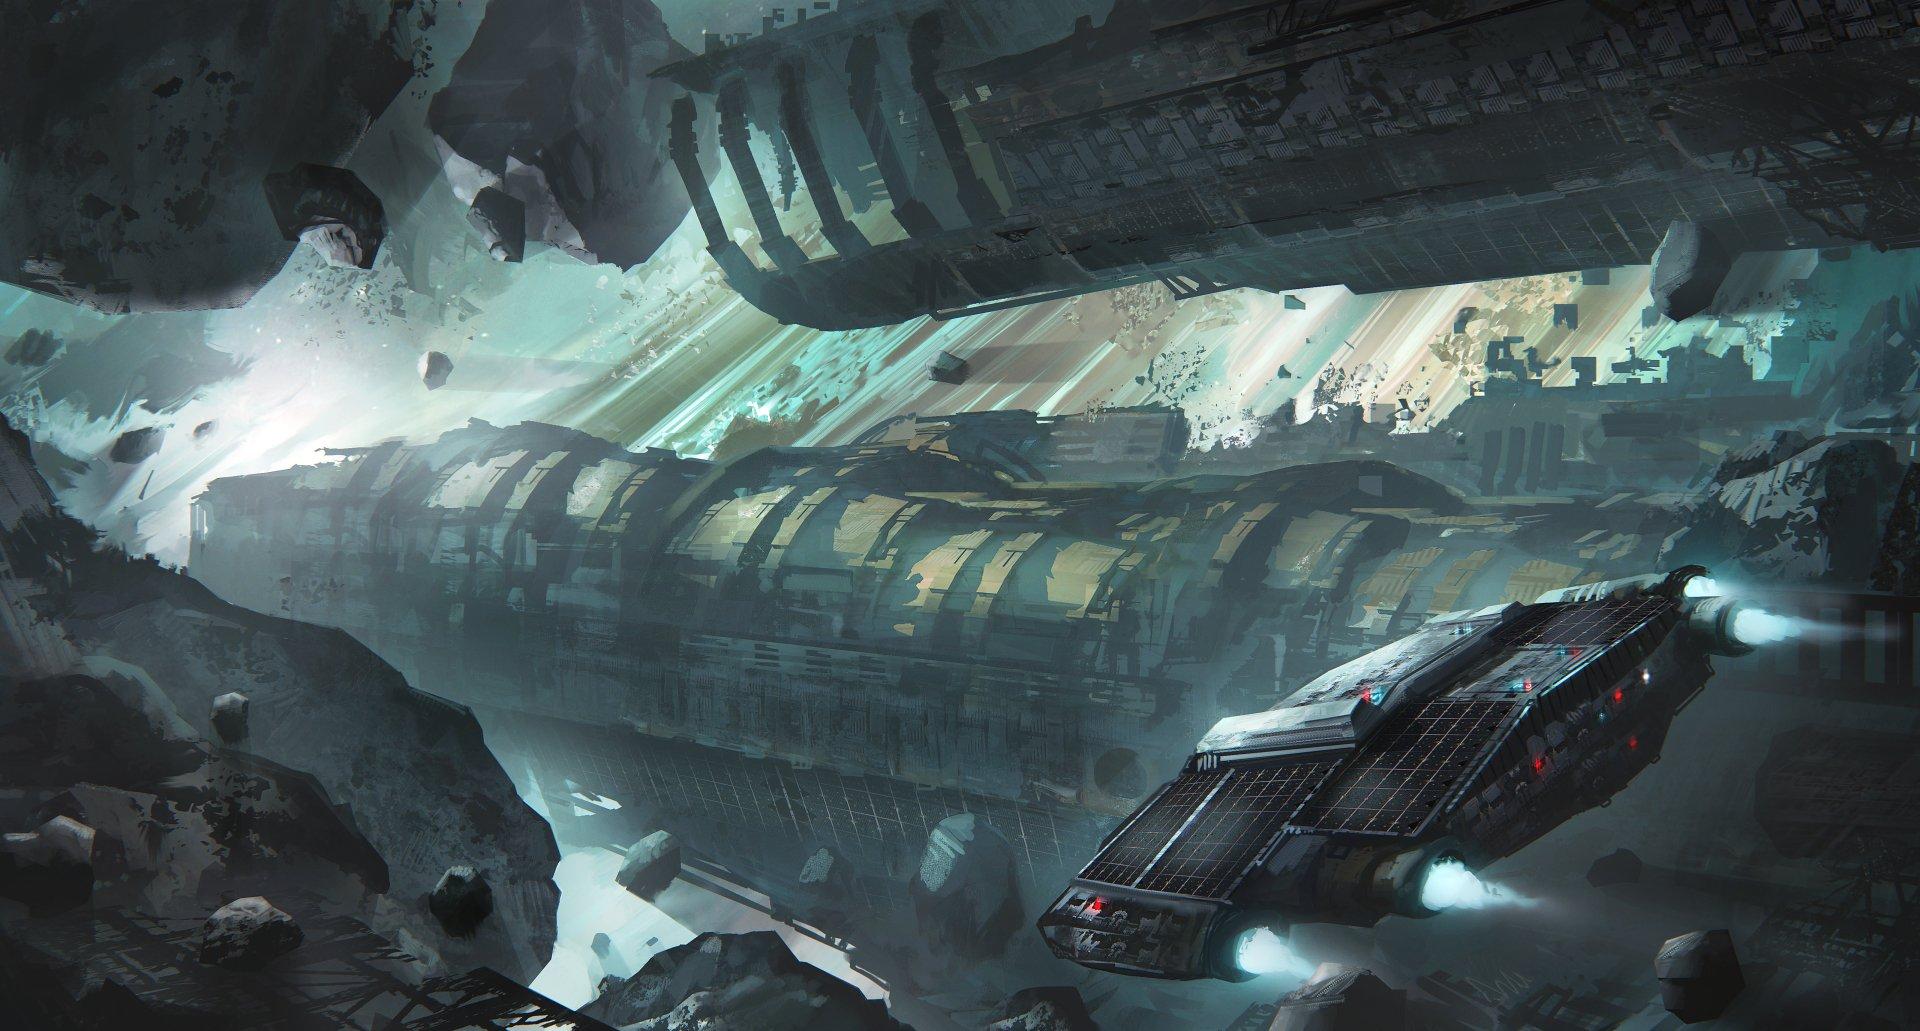 Sci Fi - Spaceship  Asteroid Wallpaper